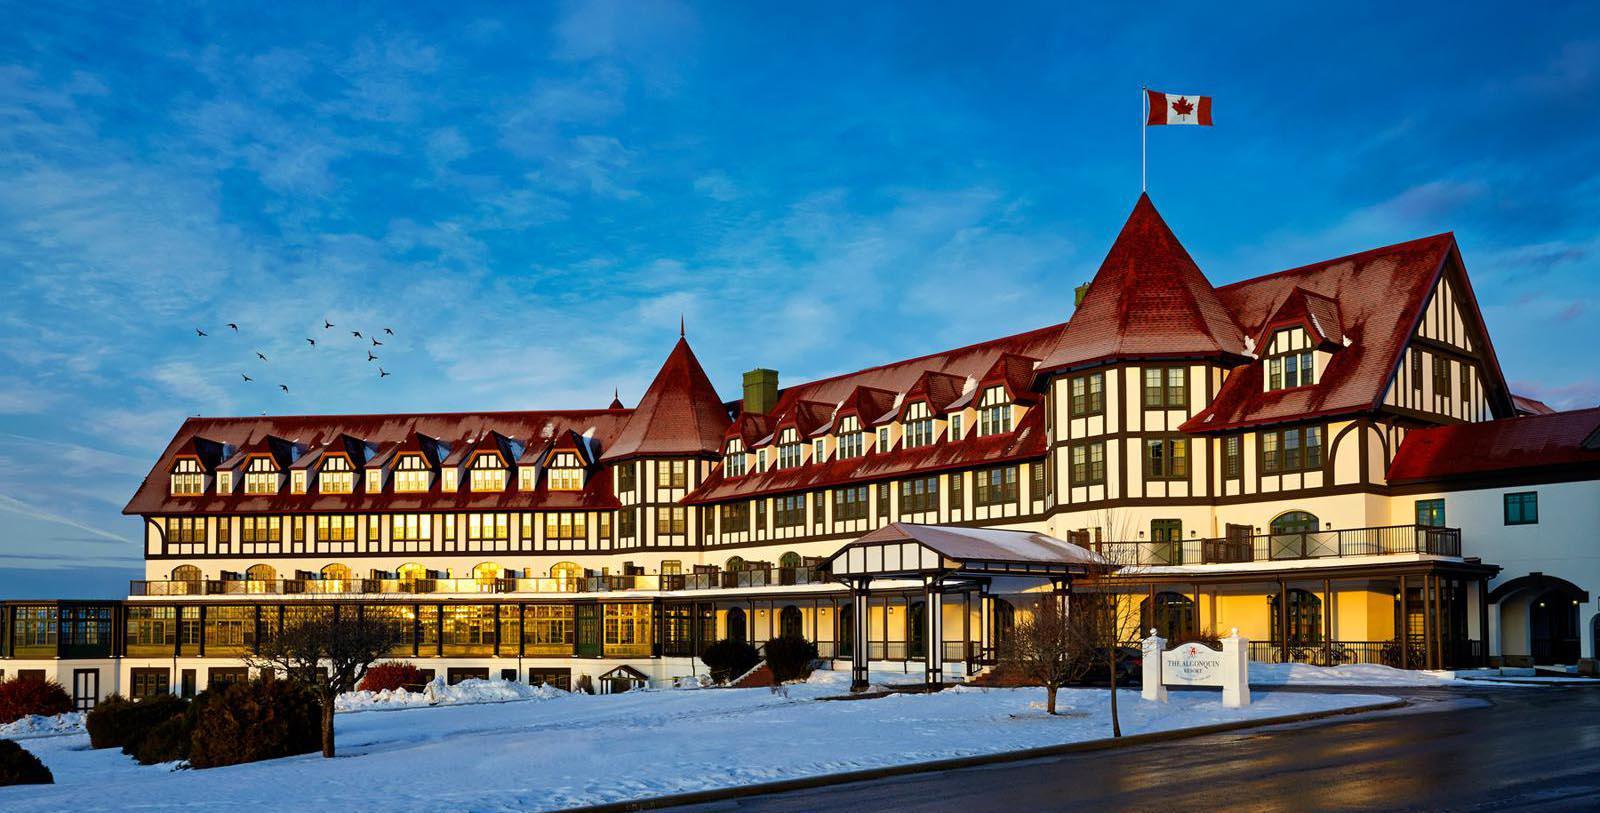 Image of exterior of the Algonquin Resort in Saint Andrews, Canada.